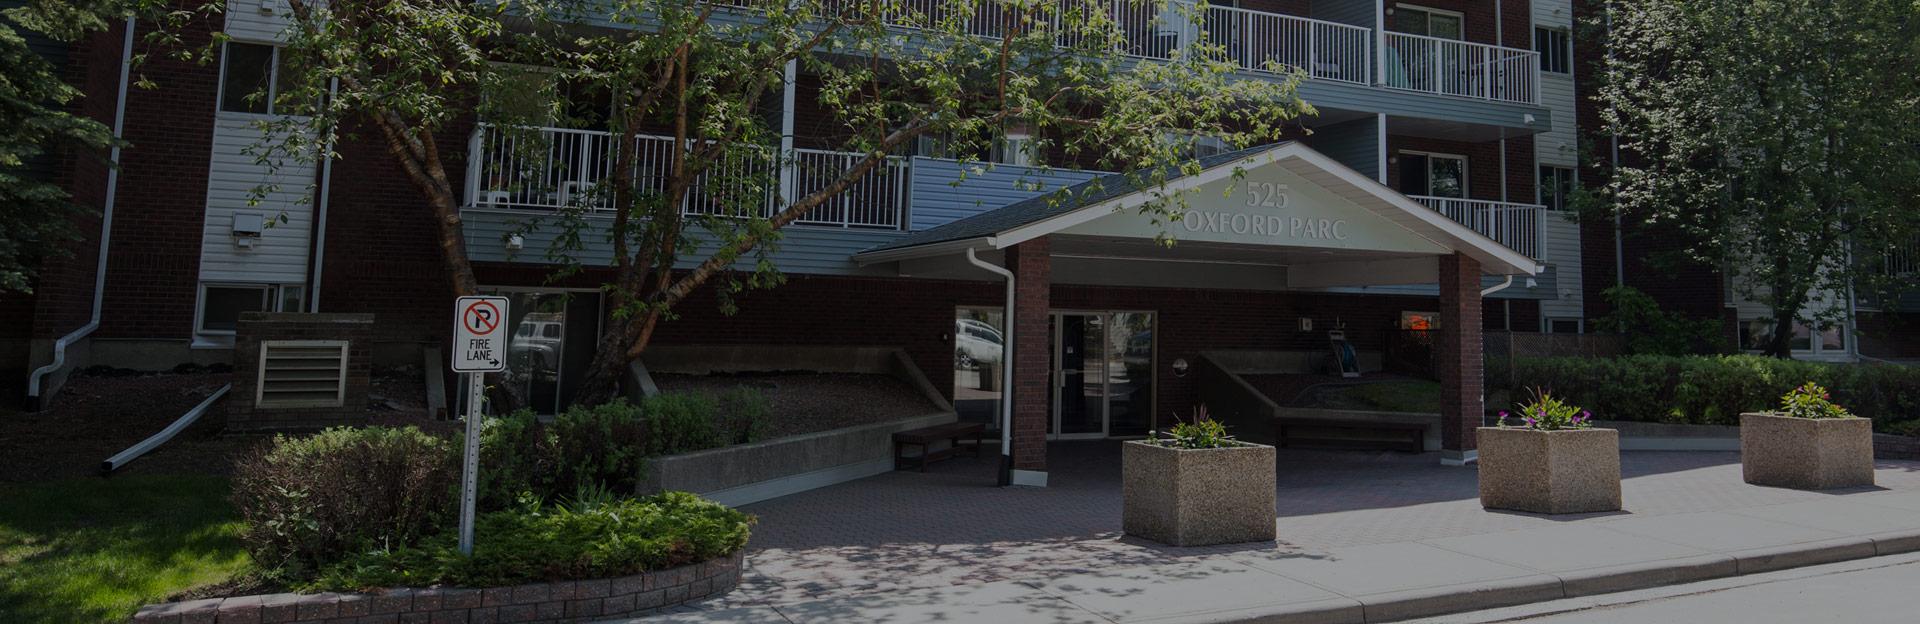 Calgary property management, Calgary condo management